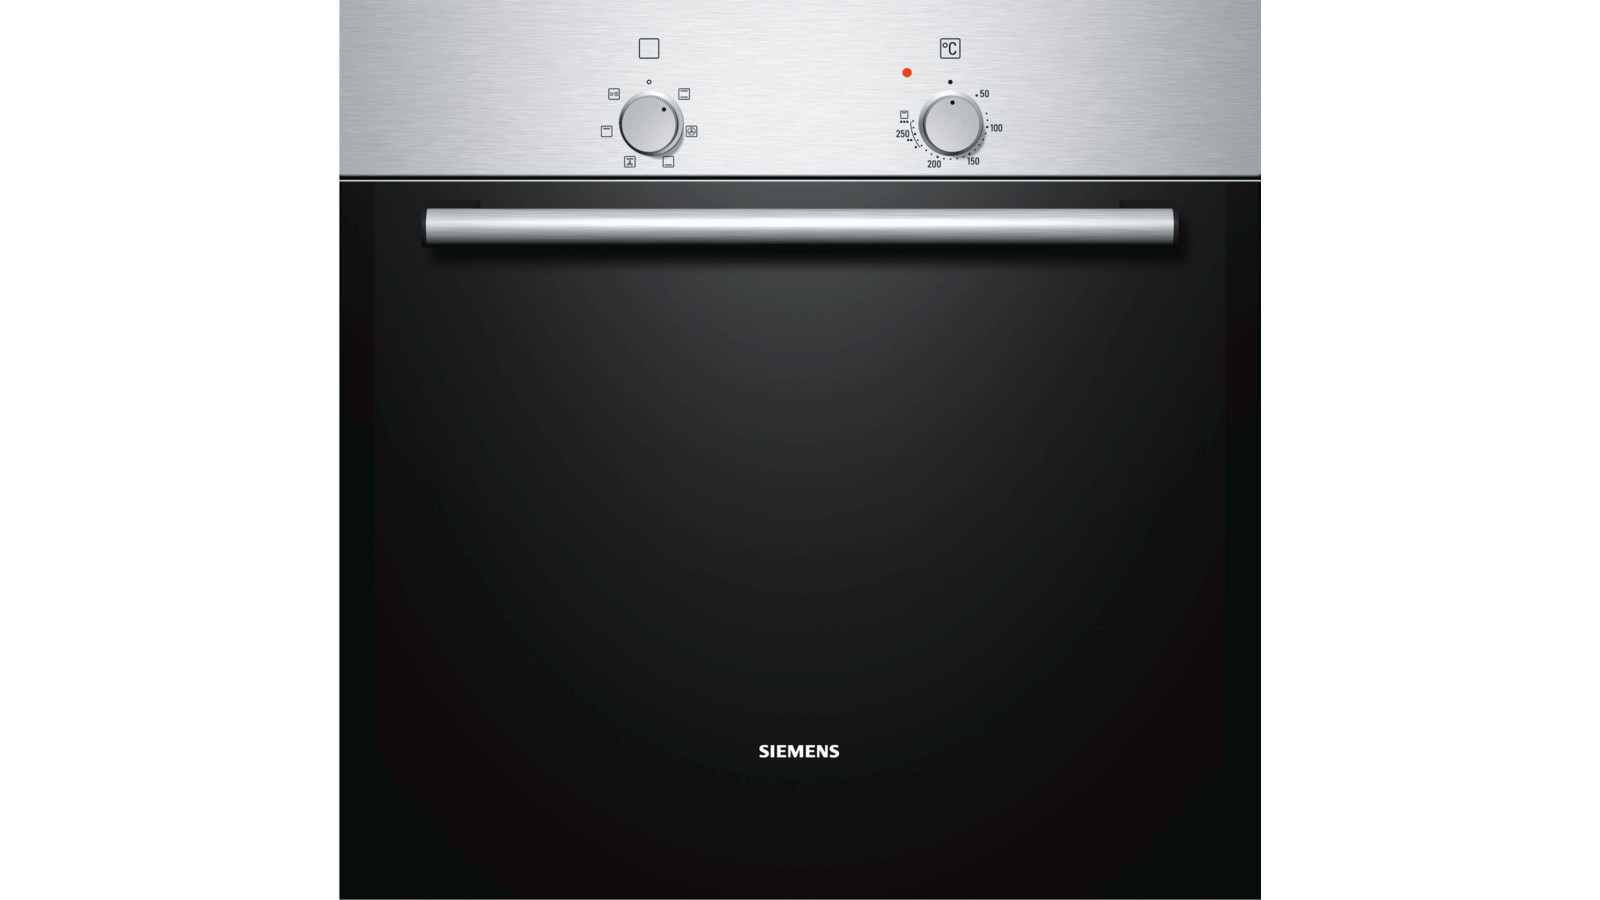 SIEMENS - HB301E0T - Ankastre Fırın